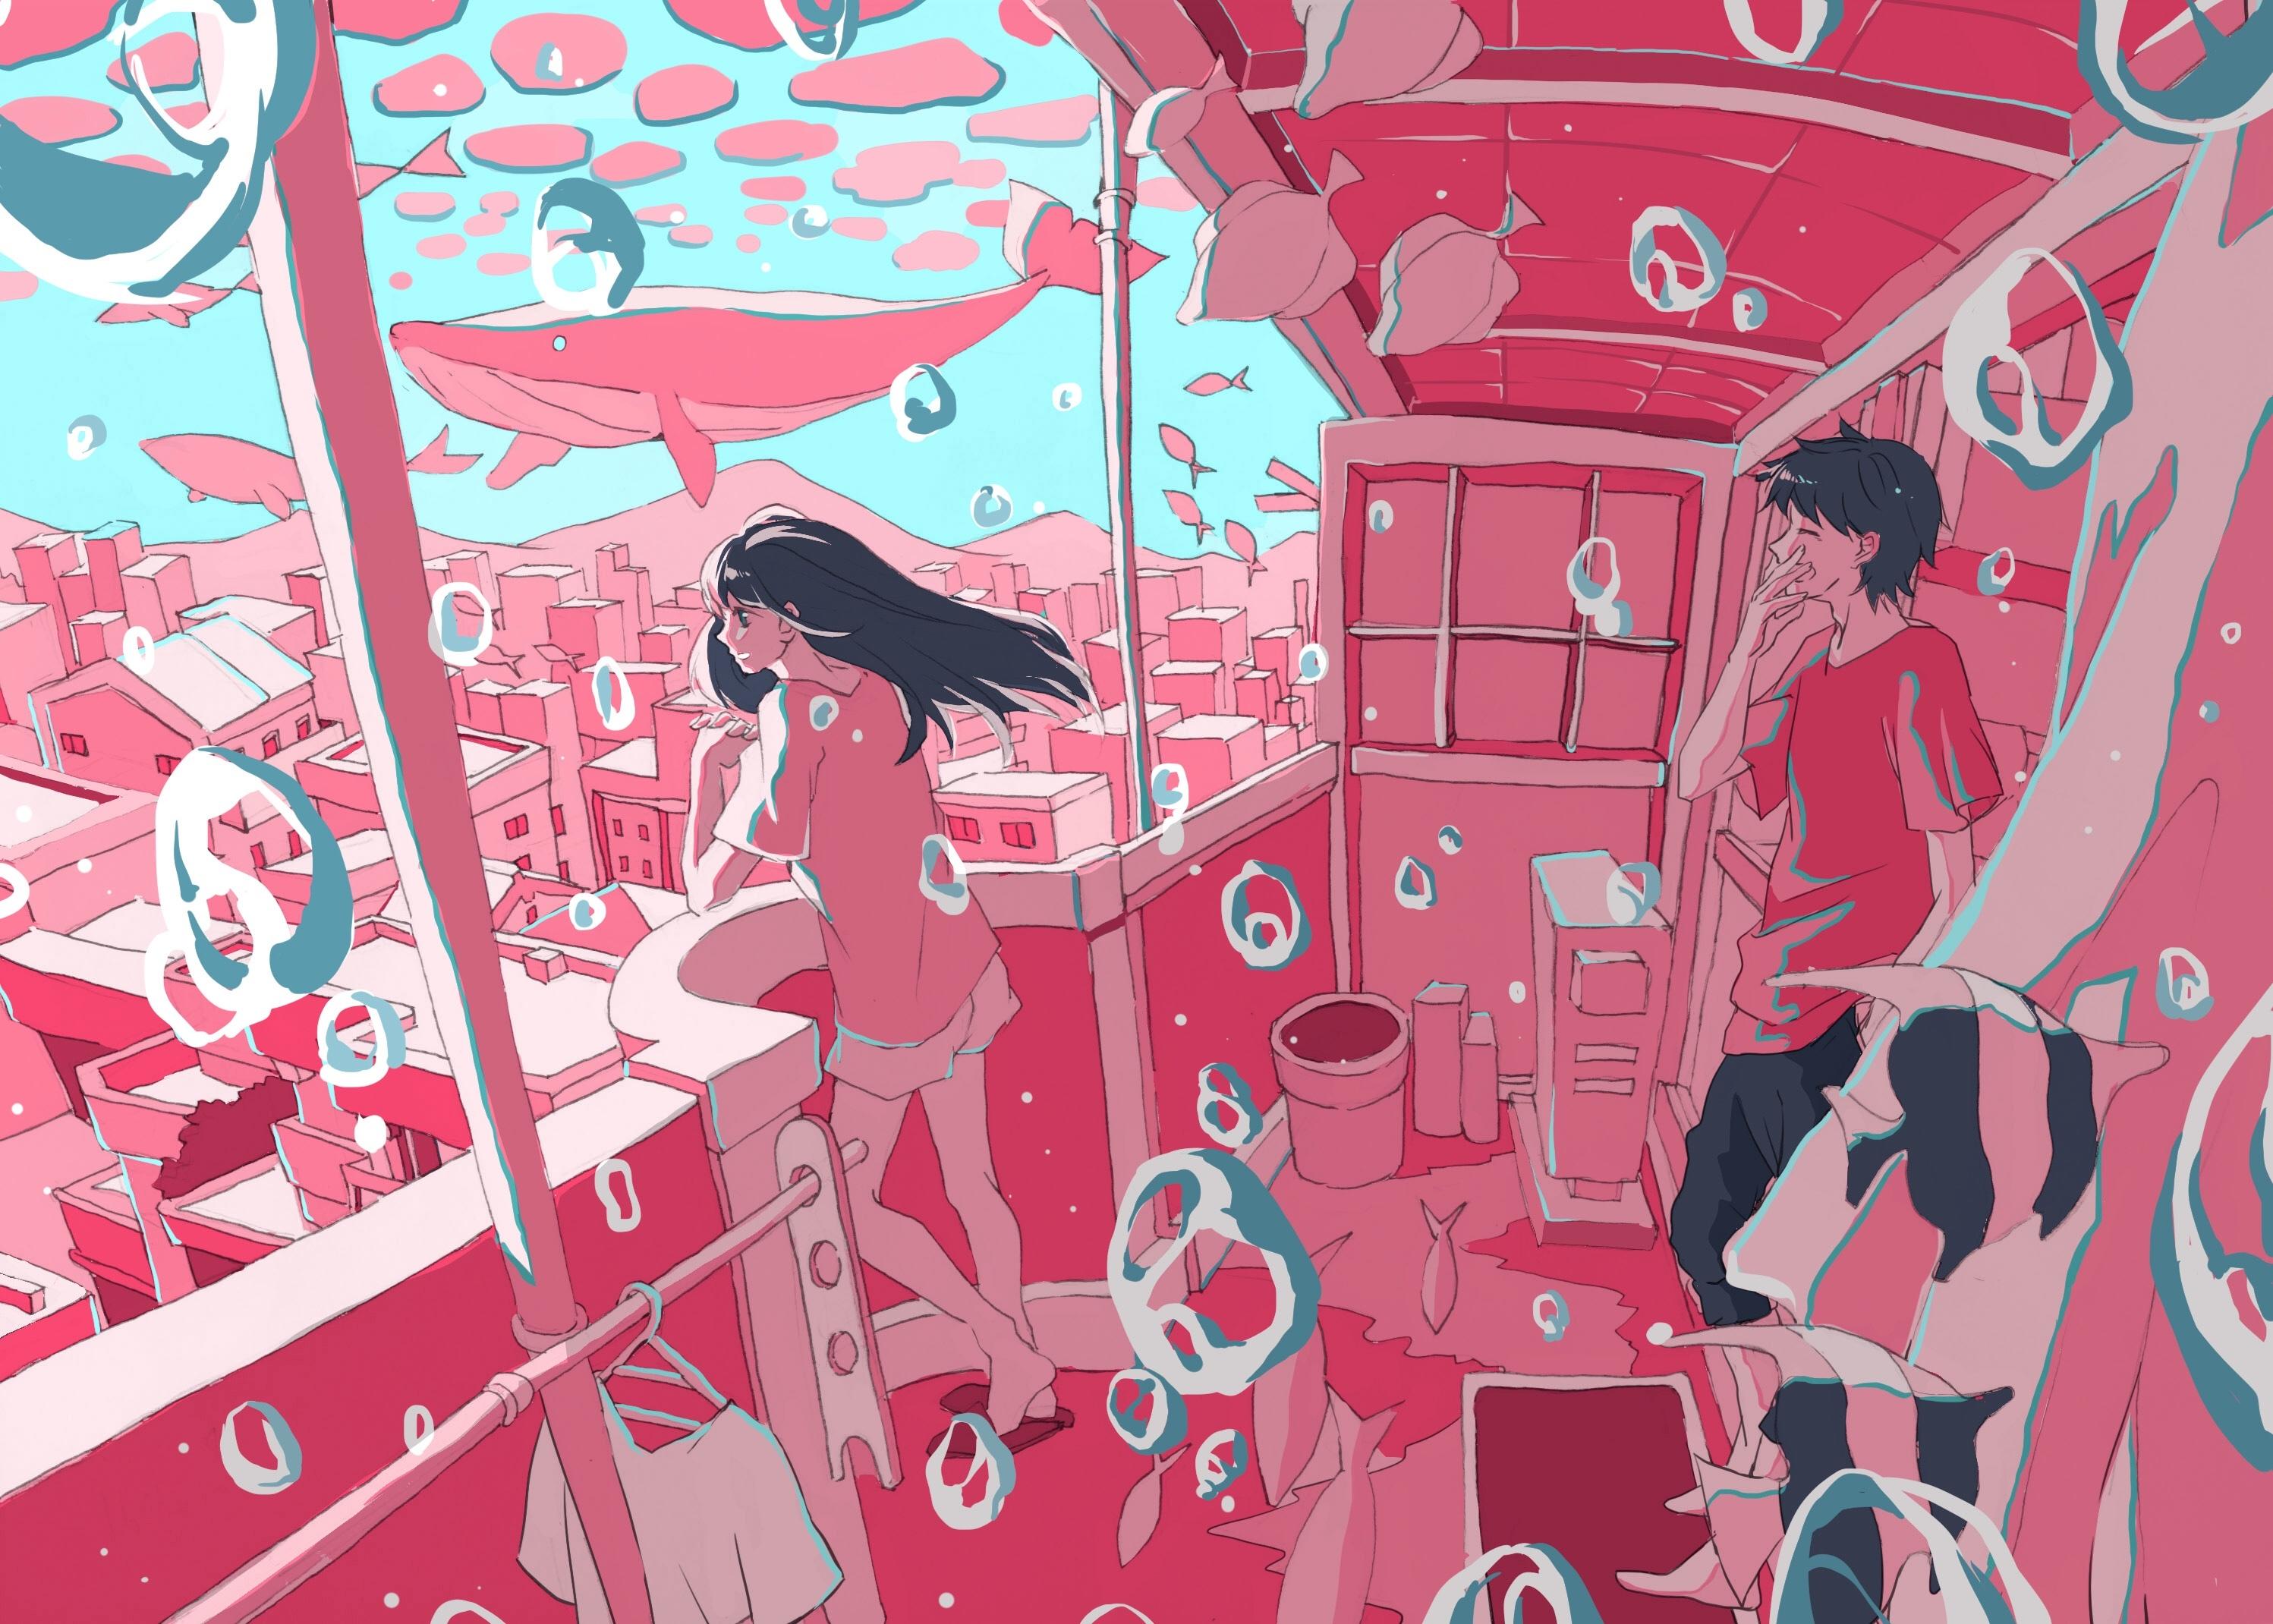 Pixiv日本画师いちご飴插画作品插图25